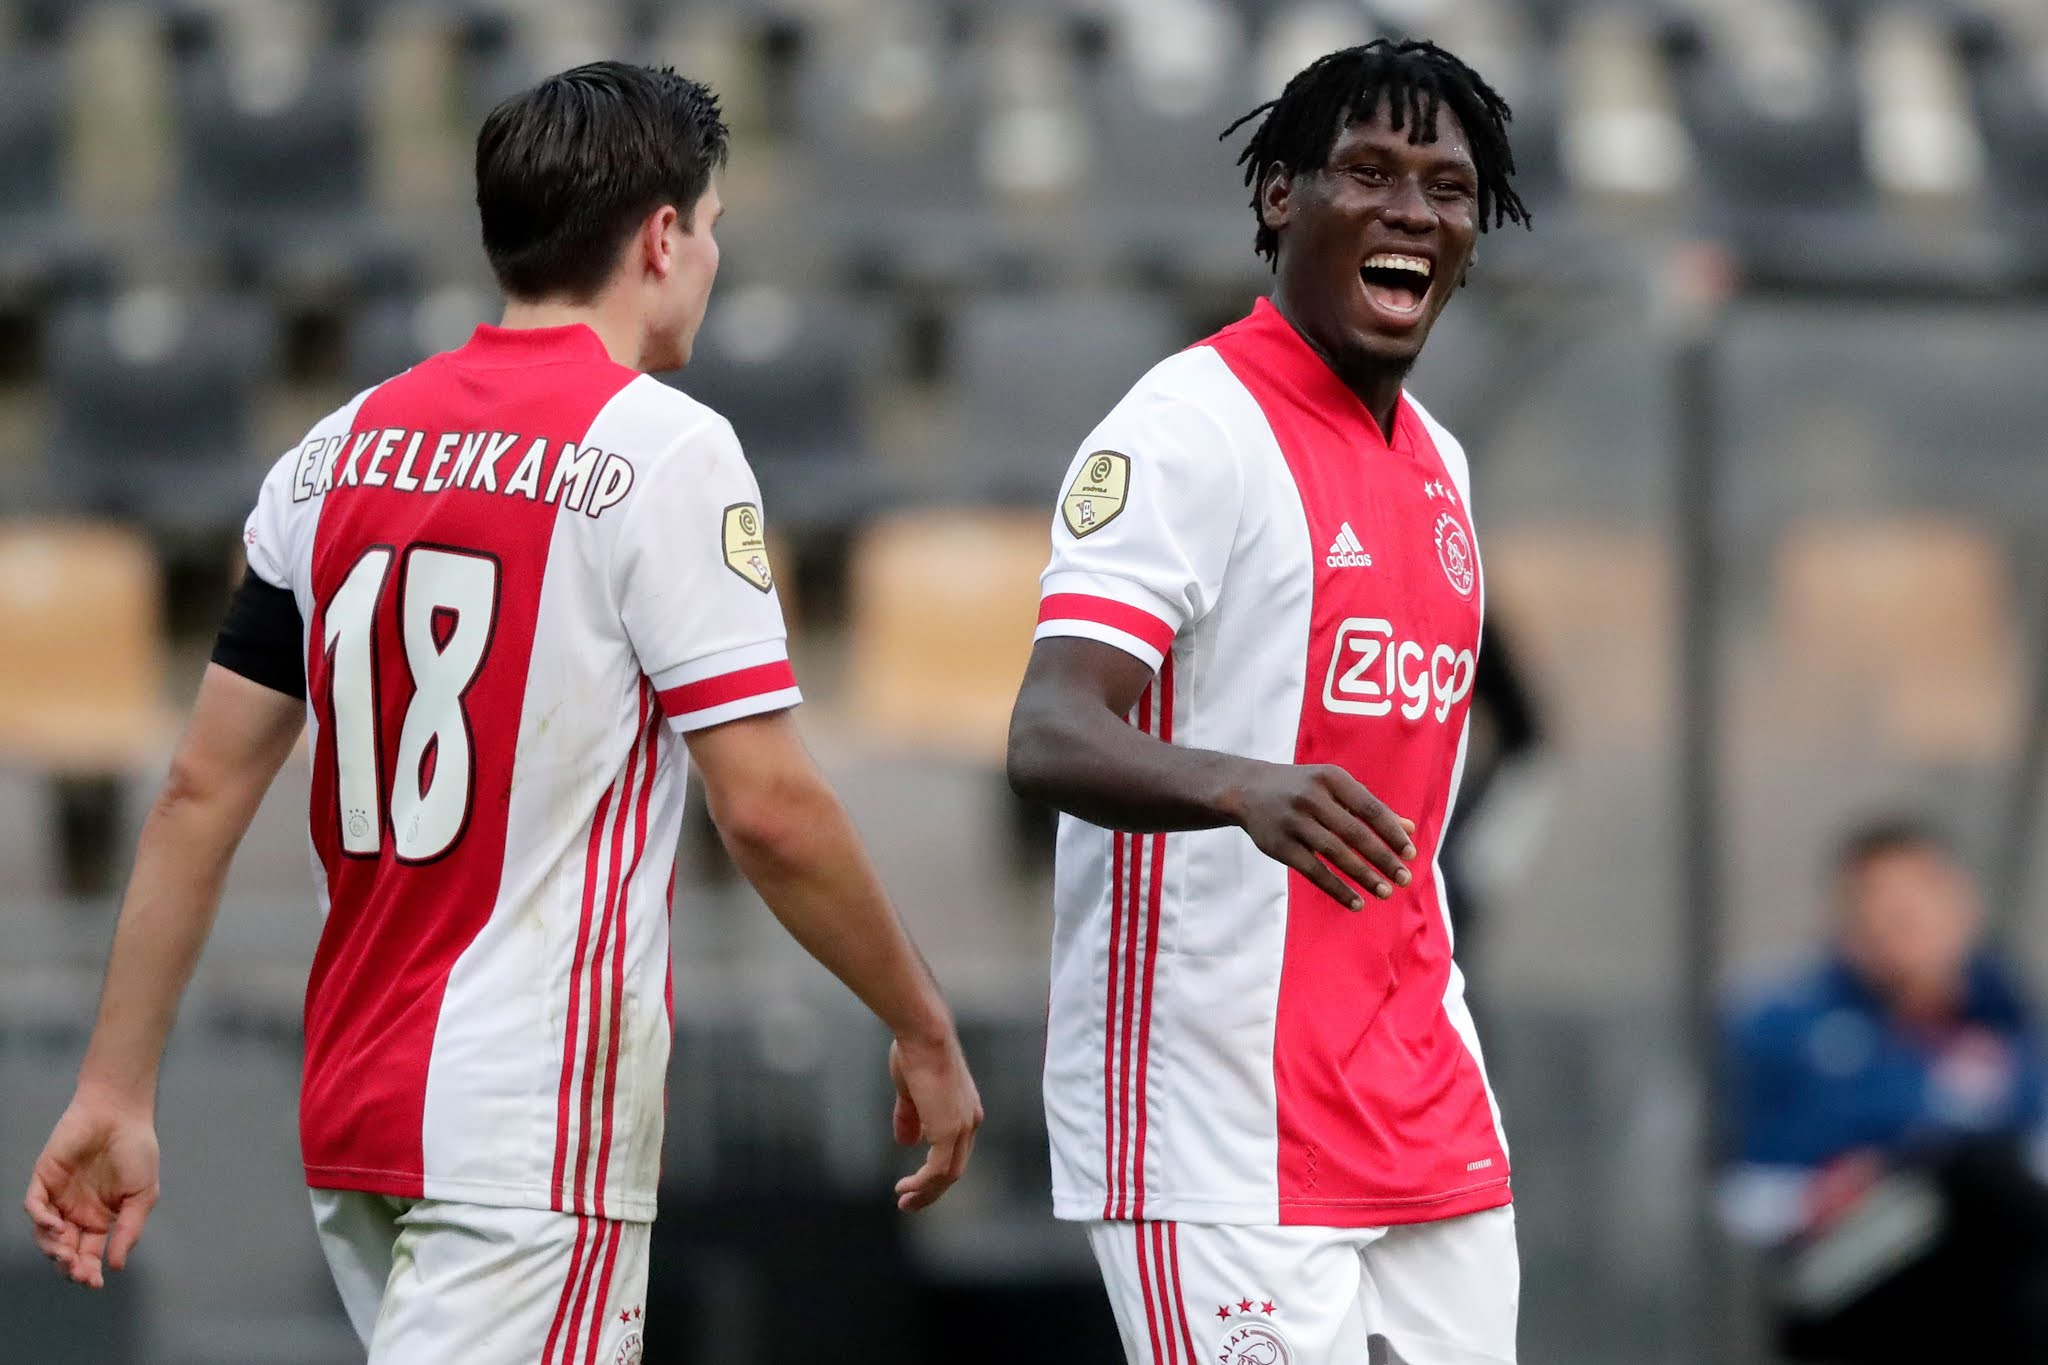 VVV-Venlo 0-13 Ajax